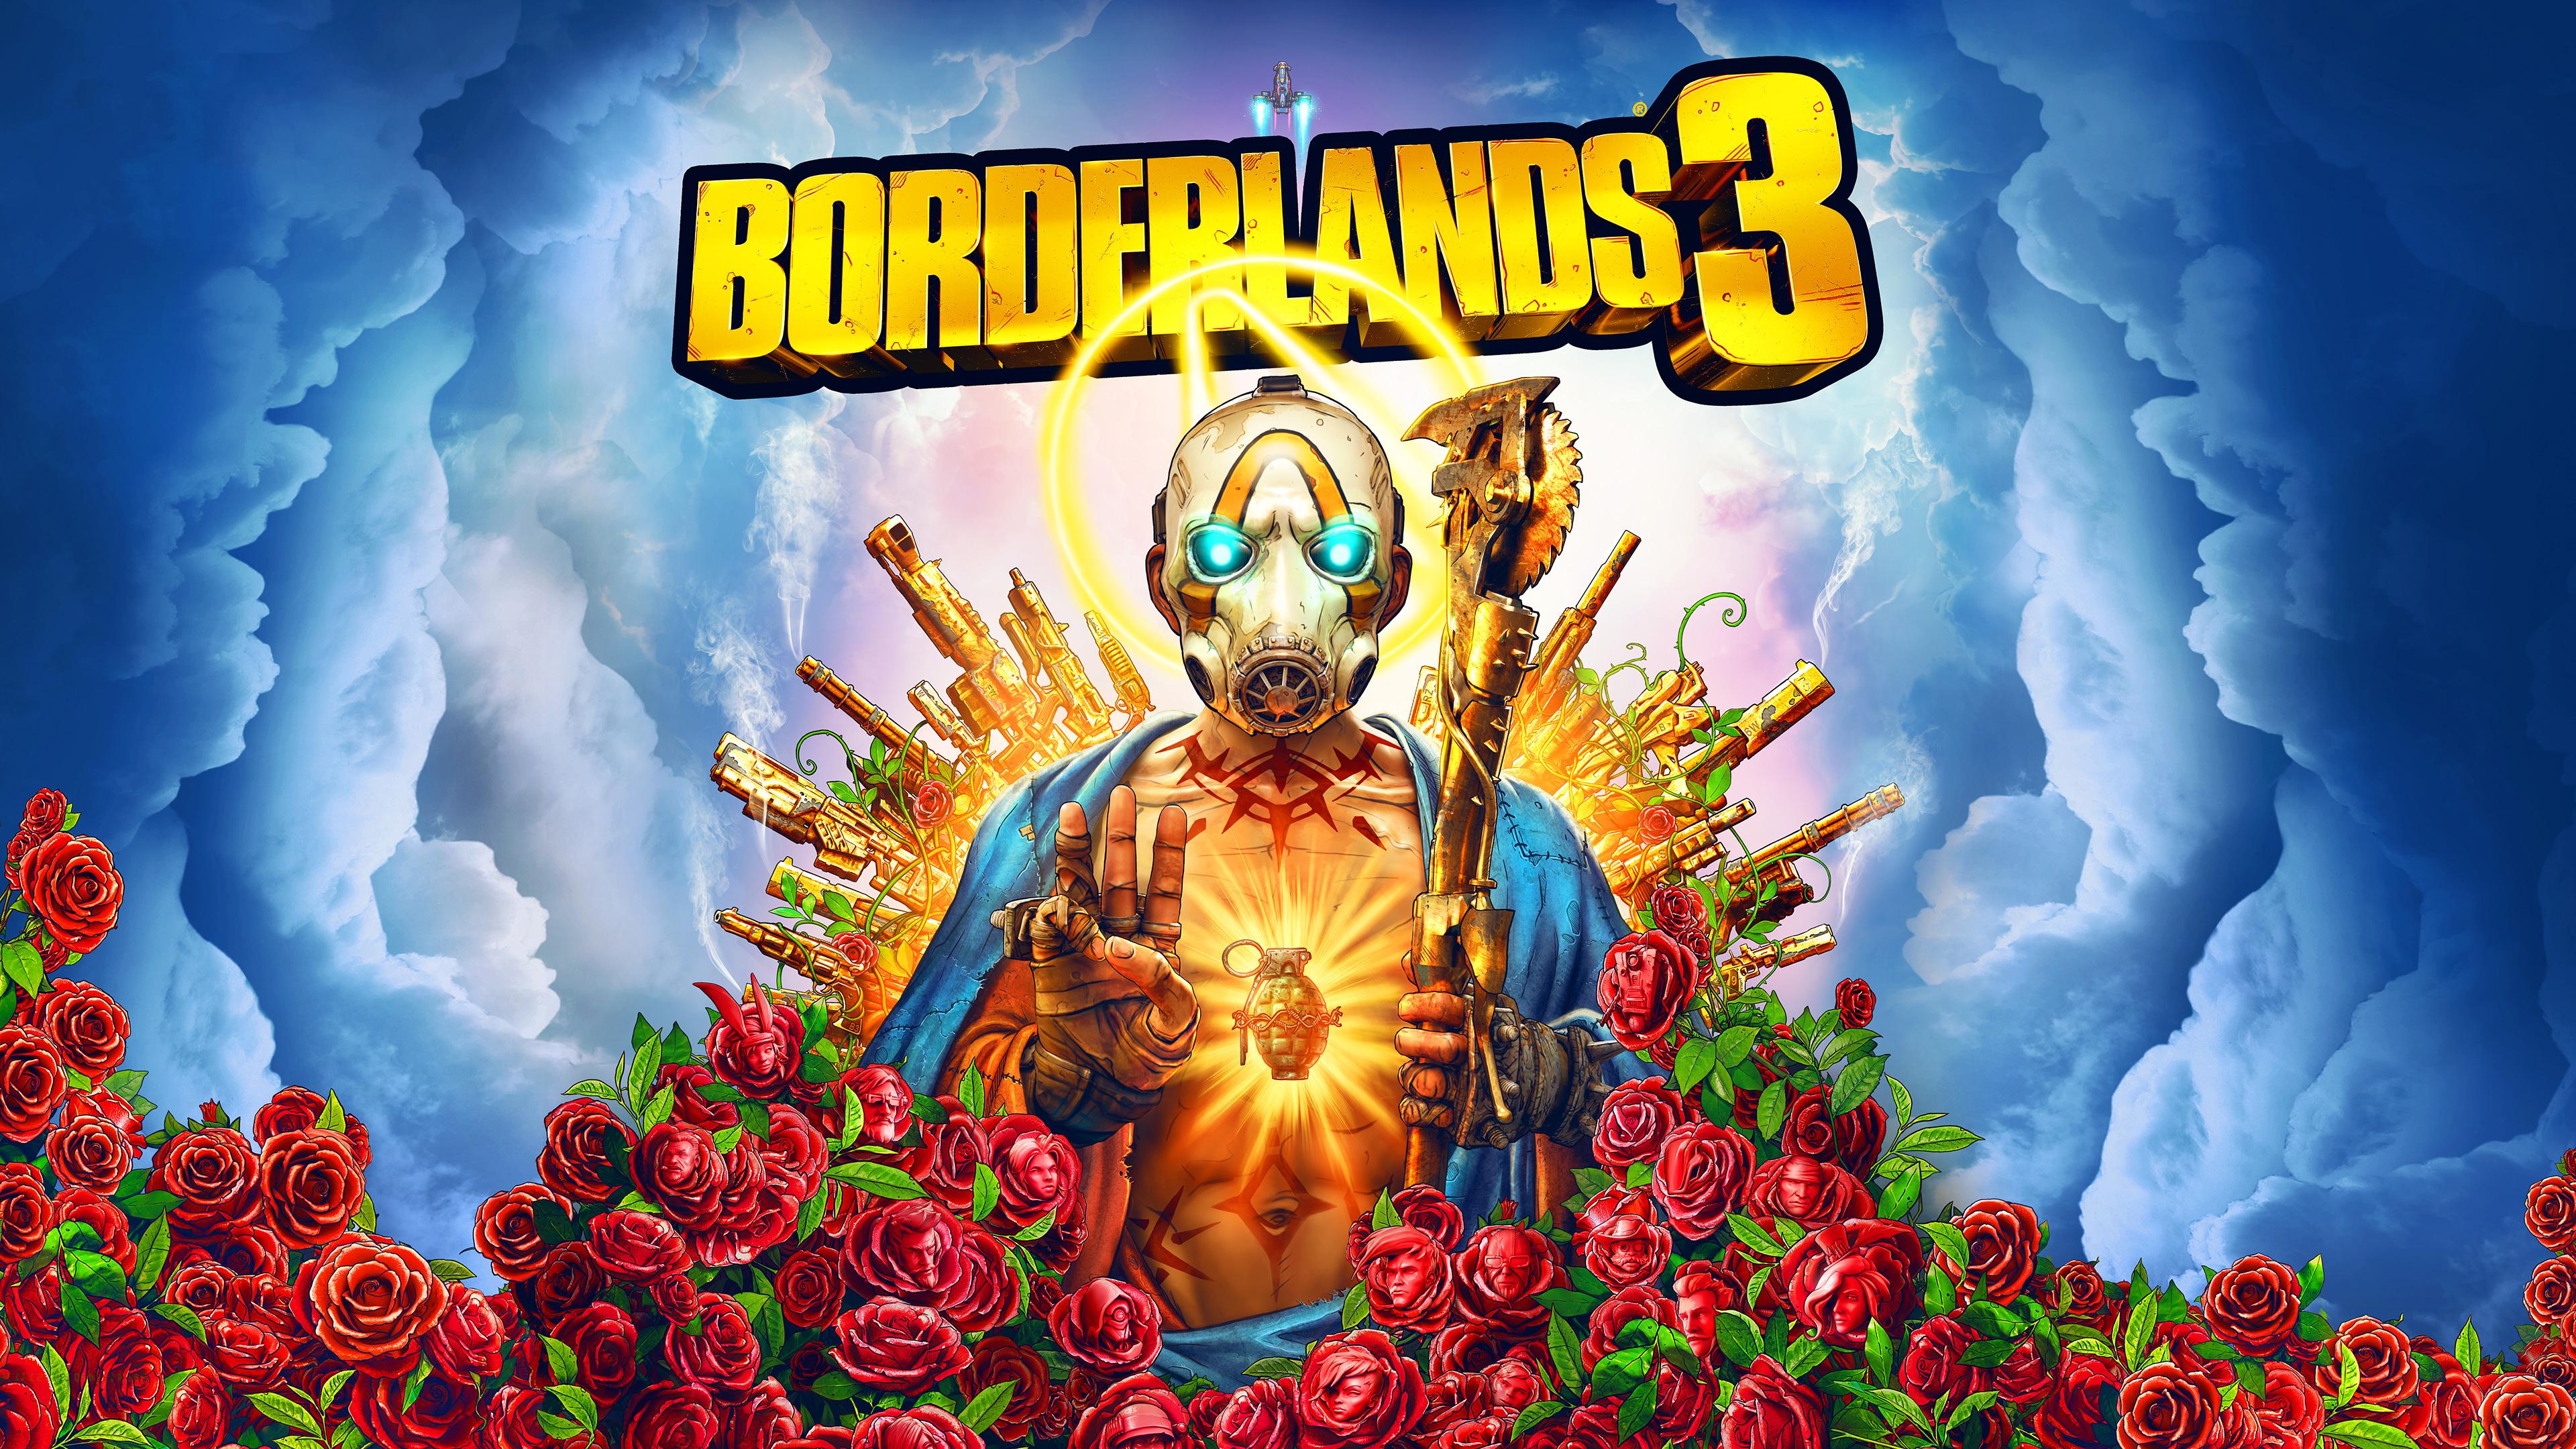 borderlands 3 poster 2019 1558221124 - Borderlands 3 Poster 2019 - poster wallpapers, hd-wallpapers, games wallpapers, borderlands 3 wallpapers, 4k-wallpapers